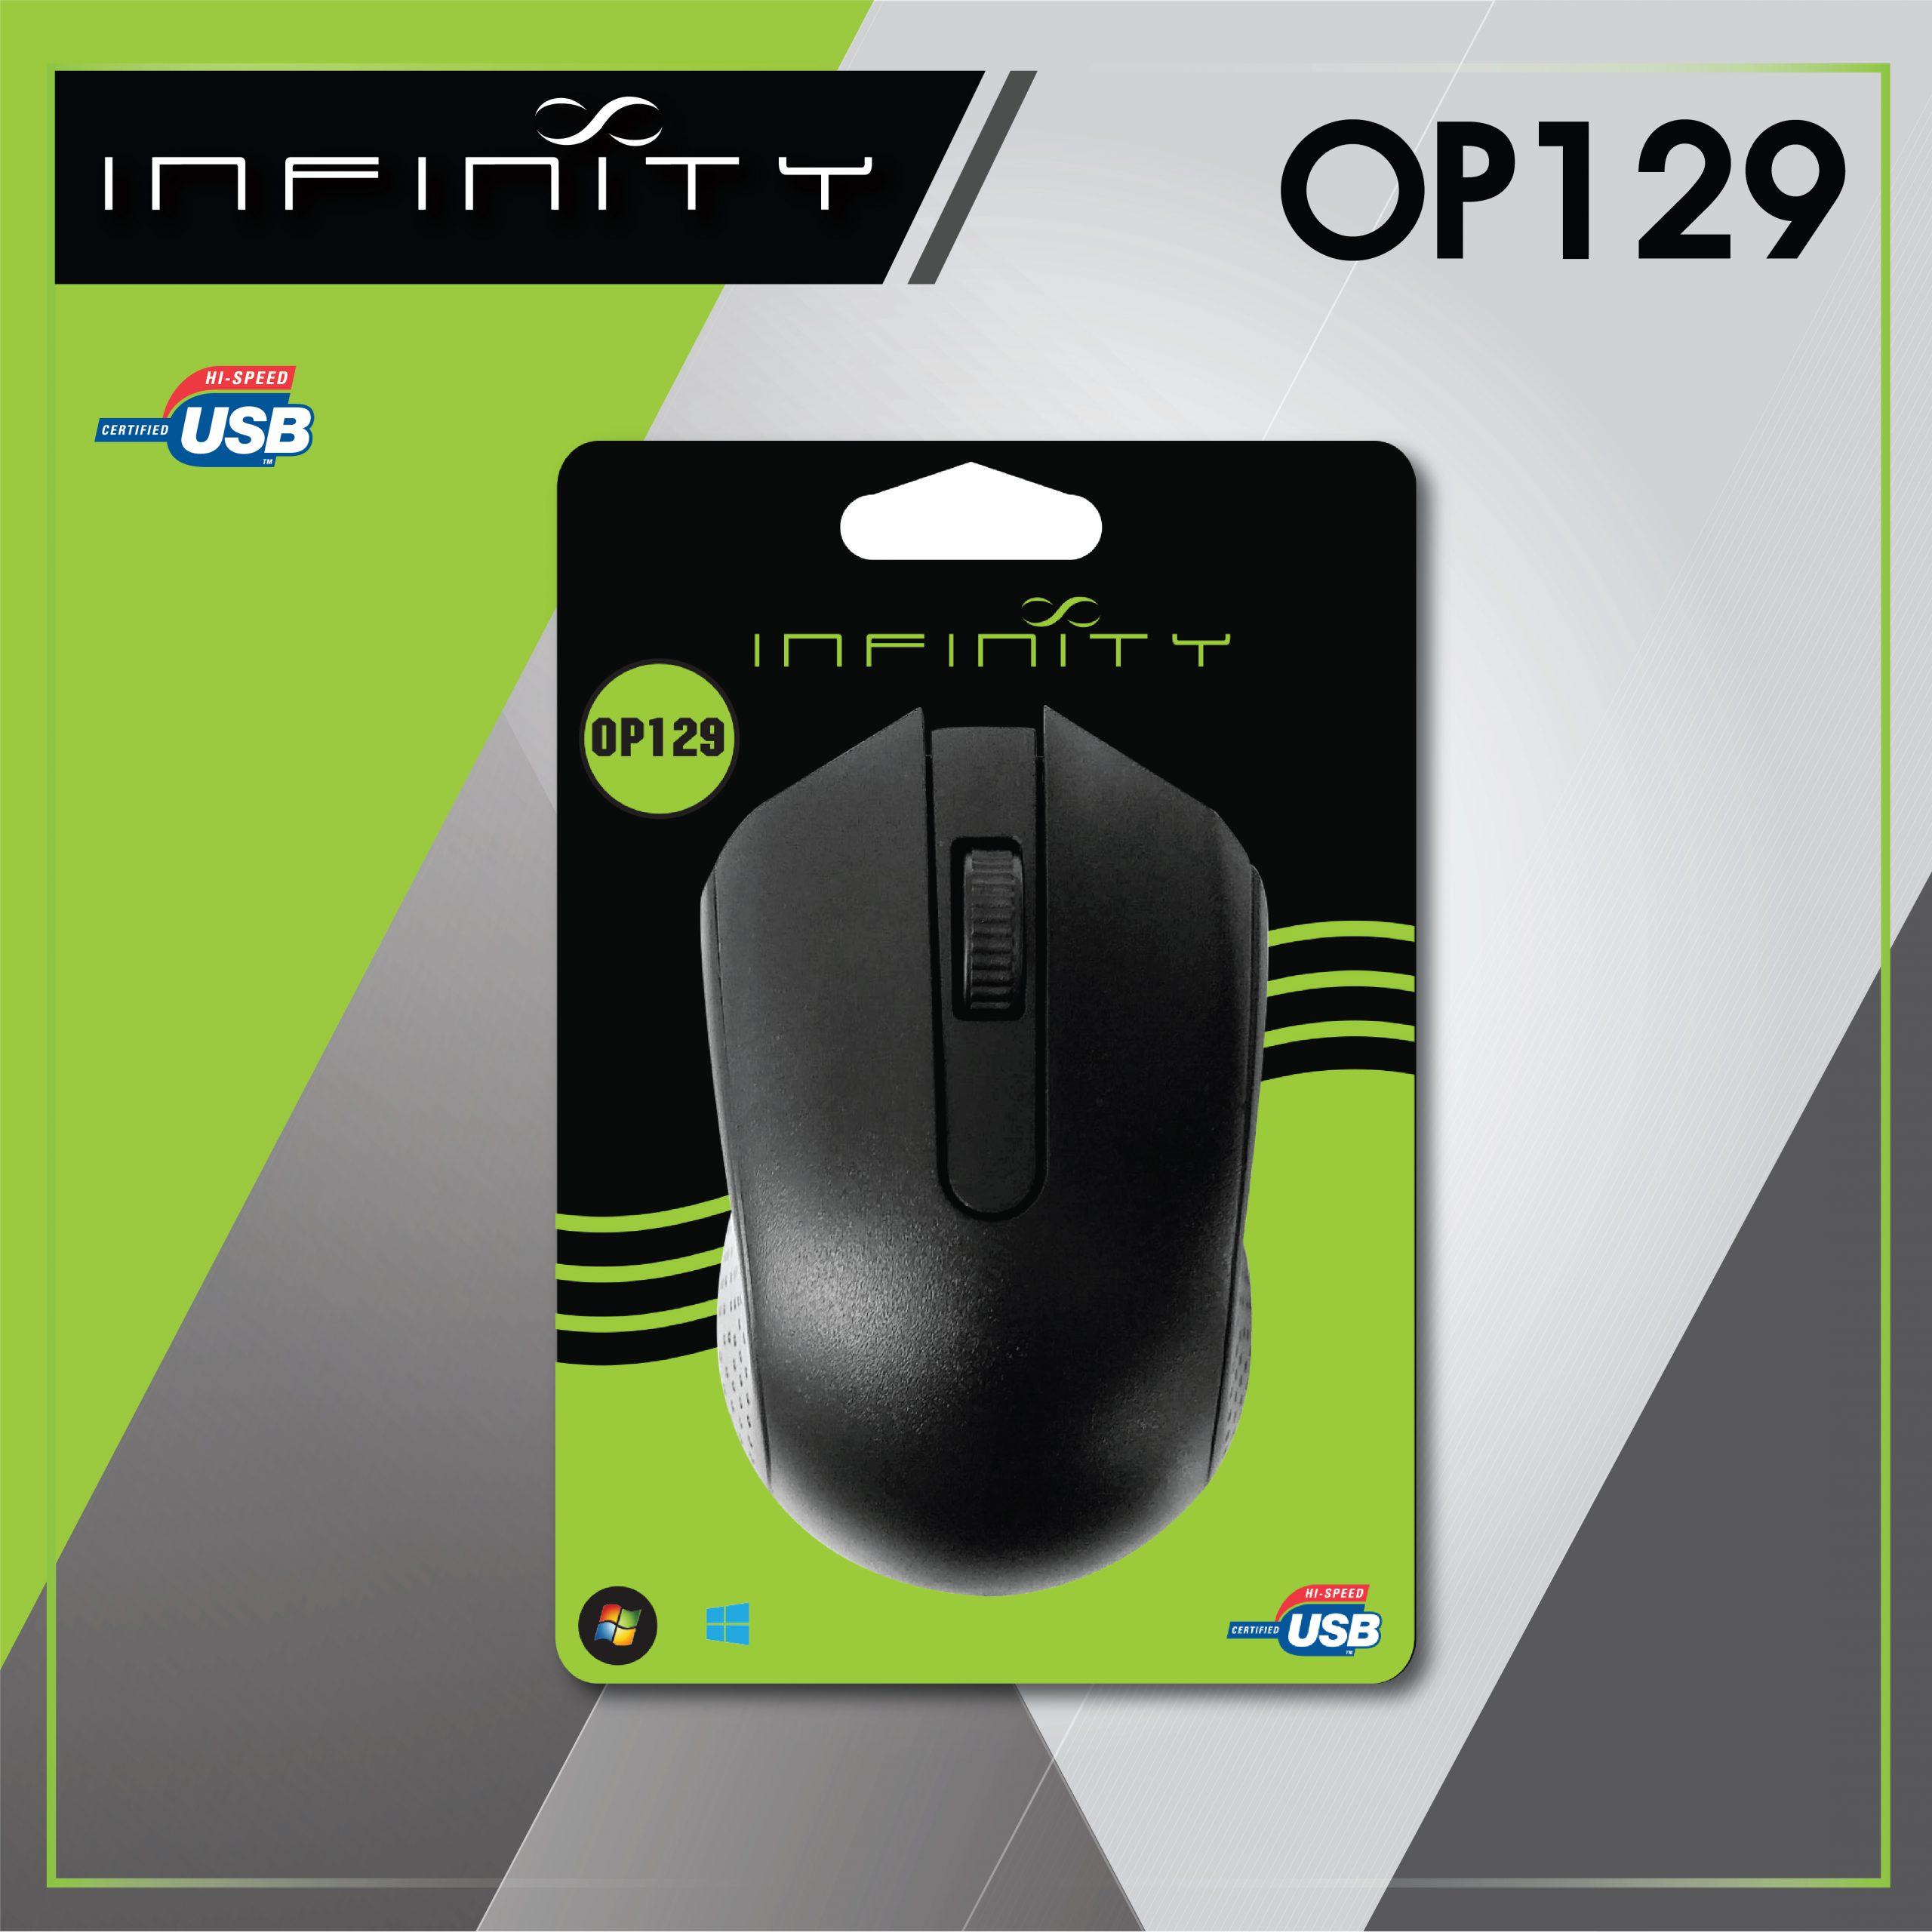 OP129